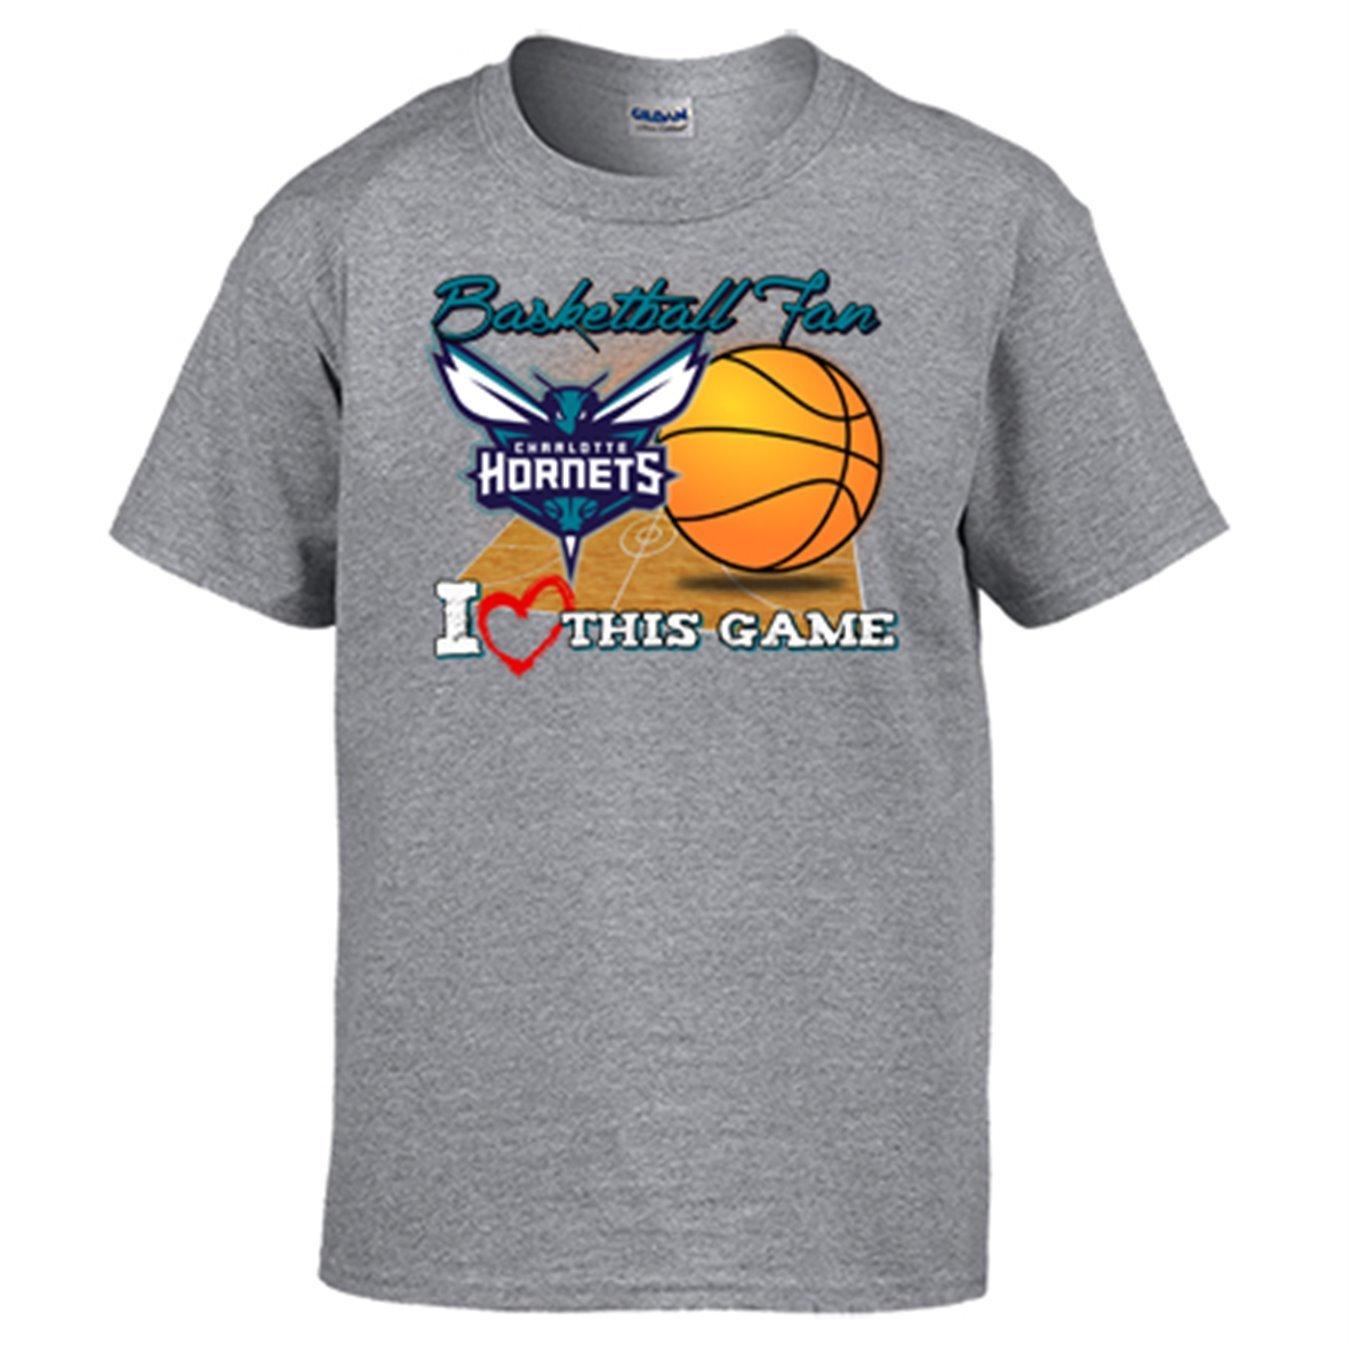 Camiseta NBA Charlotte Hornets Baloncesto Basketball fan I Love This Game: Amazon.es: Ropa y accesorios